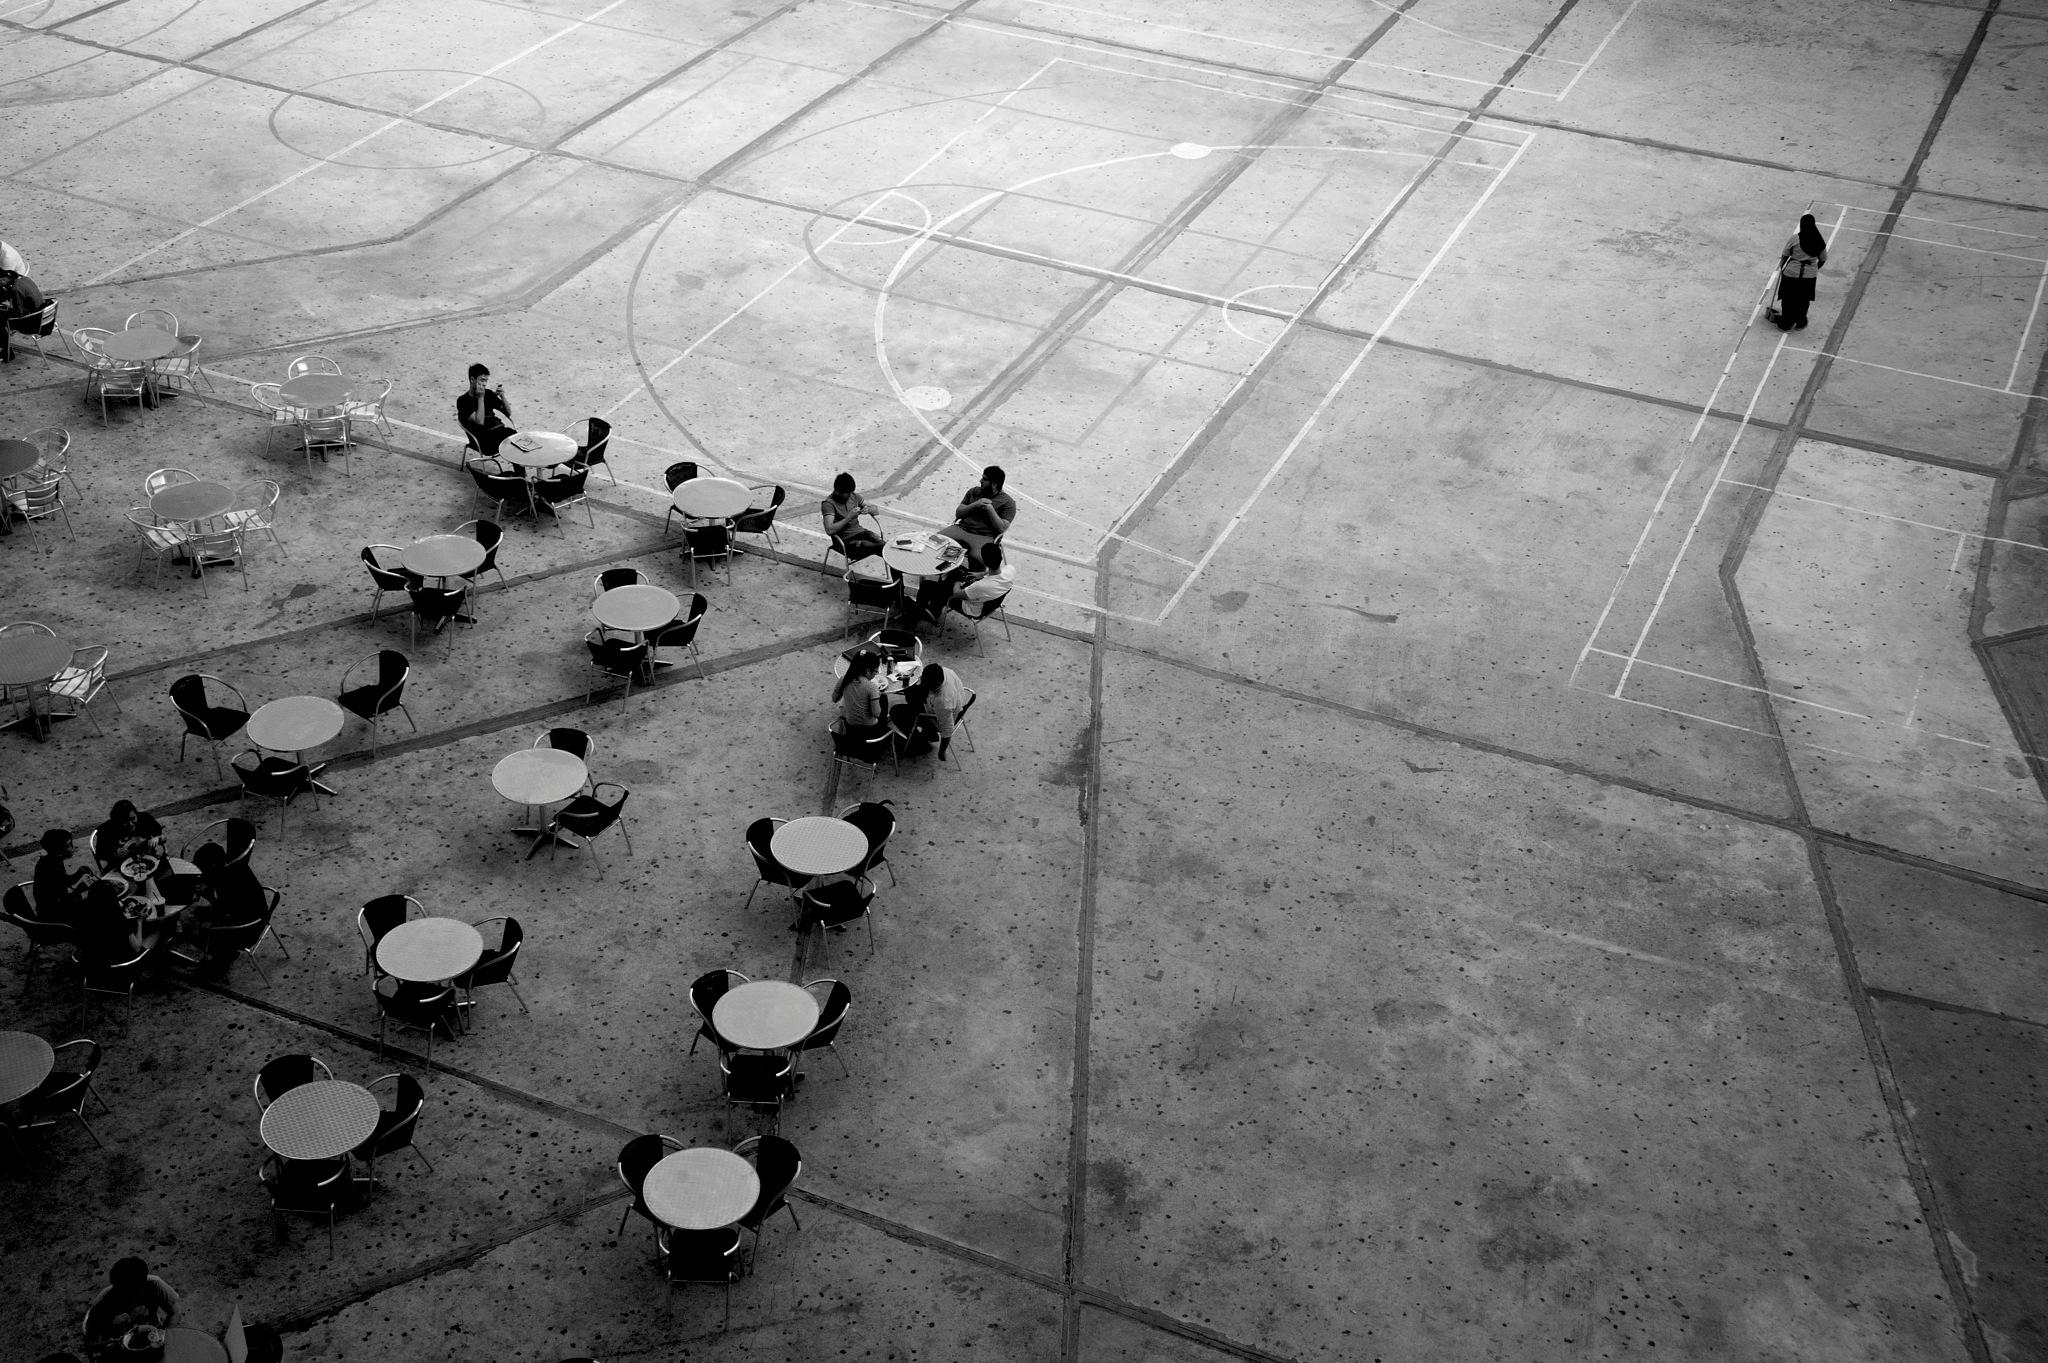 shoot the street in black n white series by Mustaffa Tapa Otai